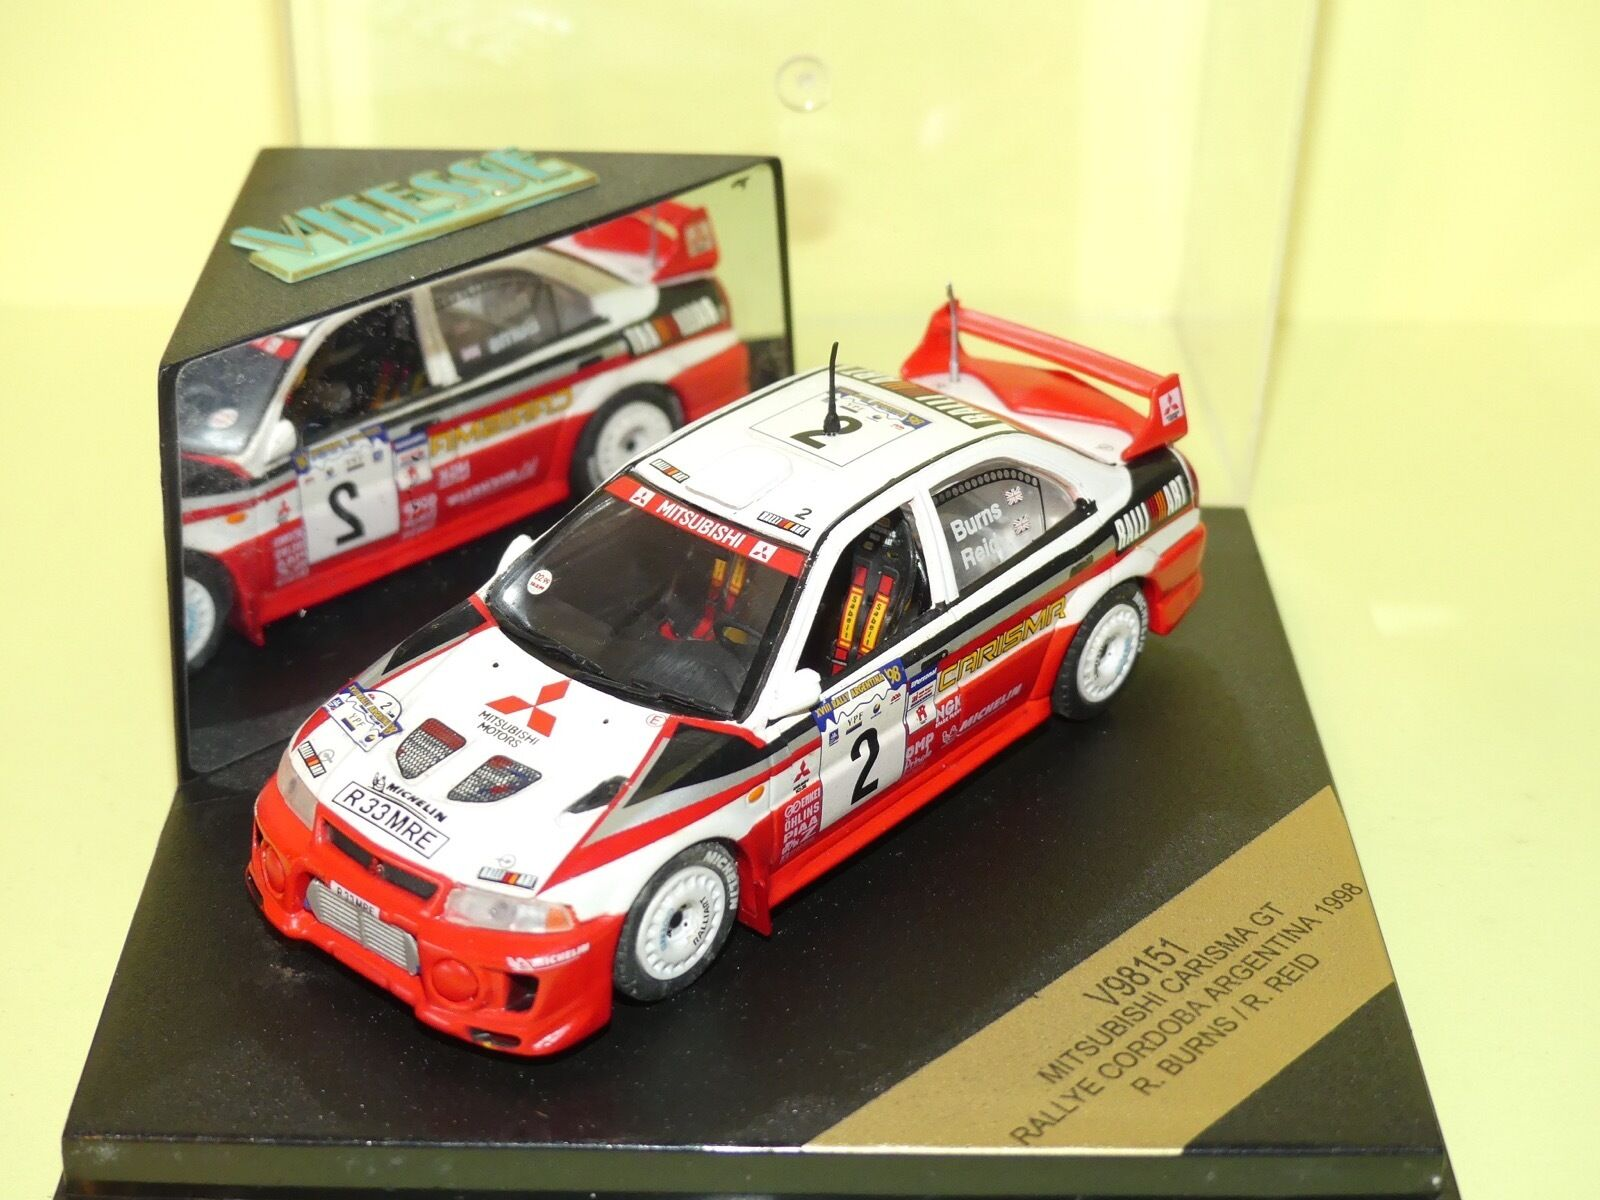 MITSUBISHI CARISMA GT RALLYE D'ARGENTINE 1998 R. BURNS VITESSE V98151 1 43